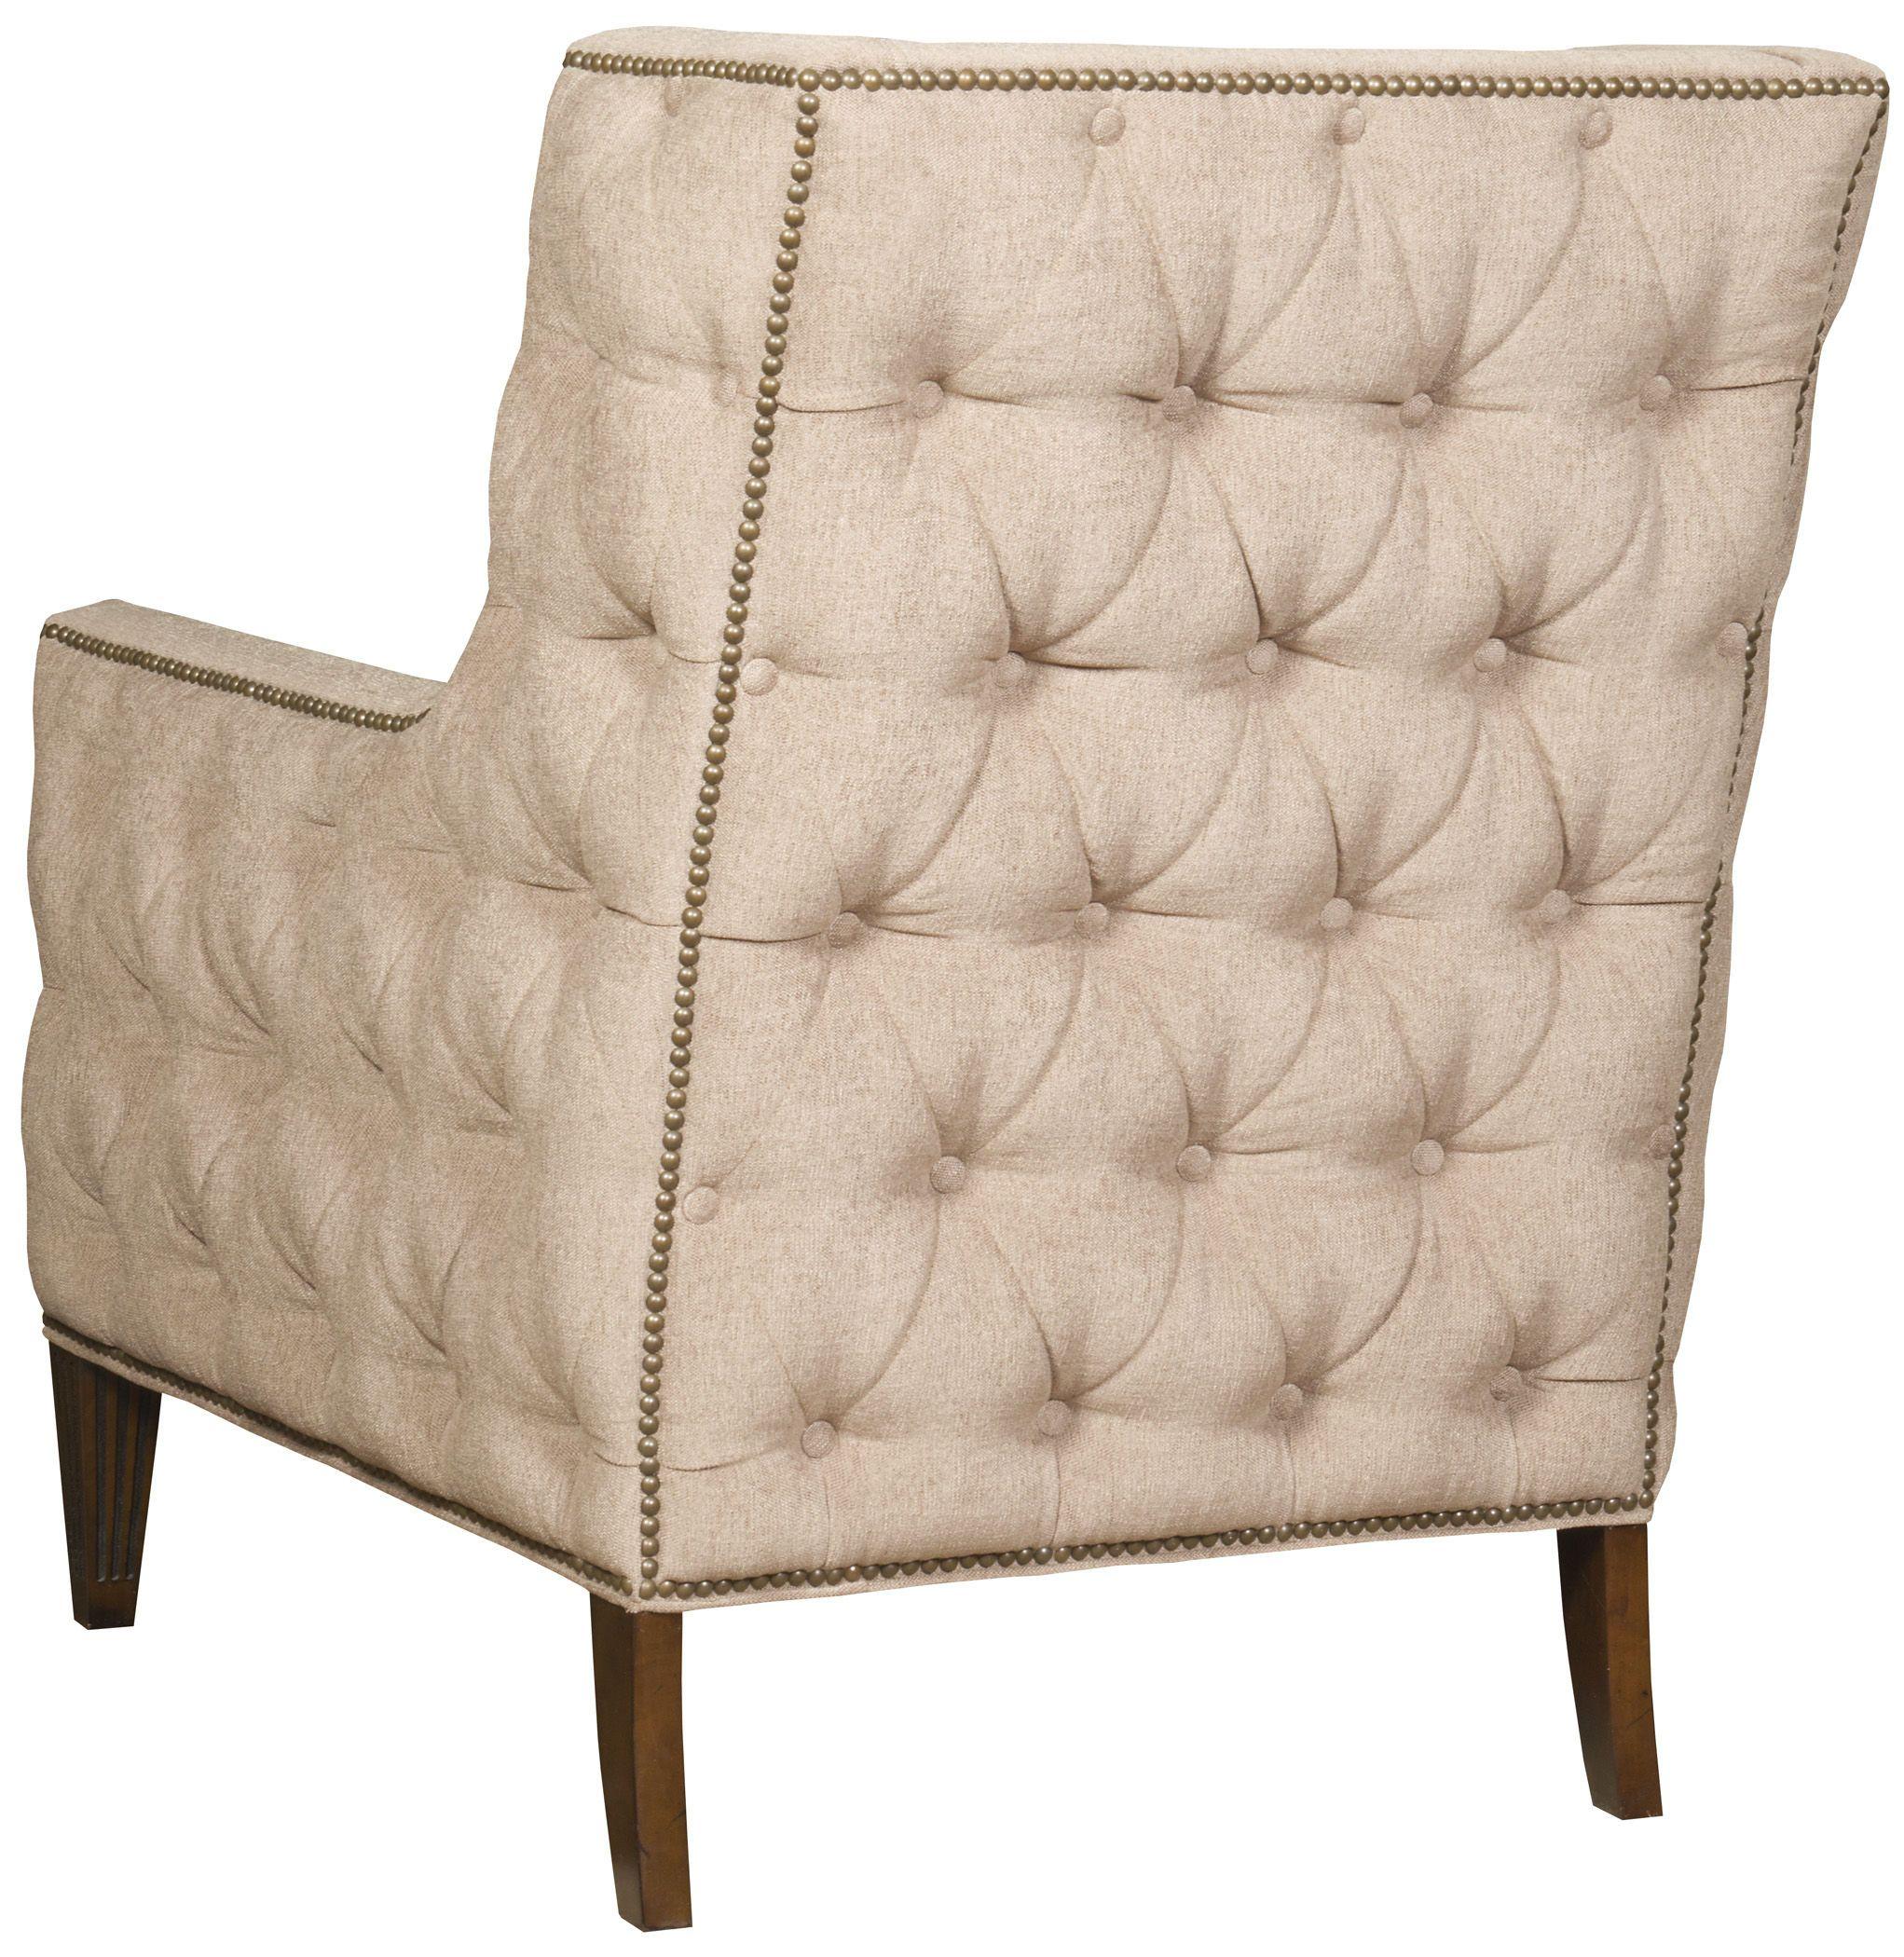 Incroyable Vanguard Living Room Chair V243 CH   Vanguard Furniture   Conover